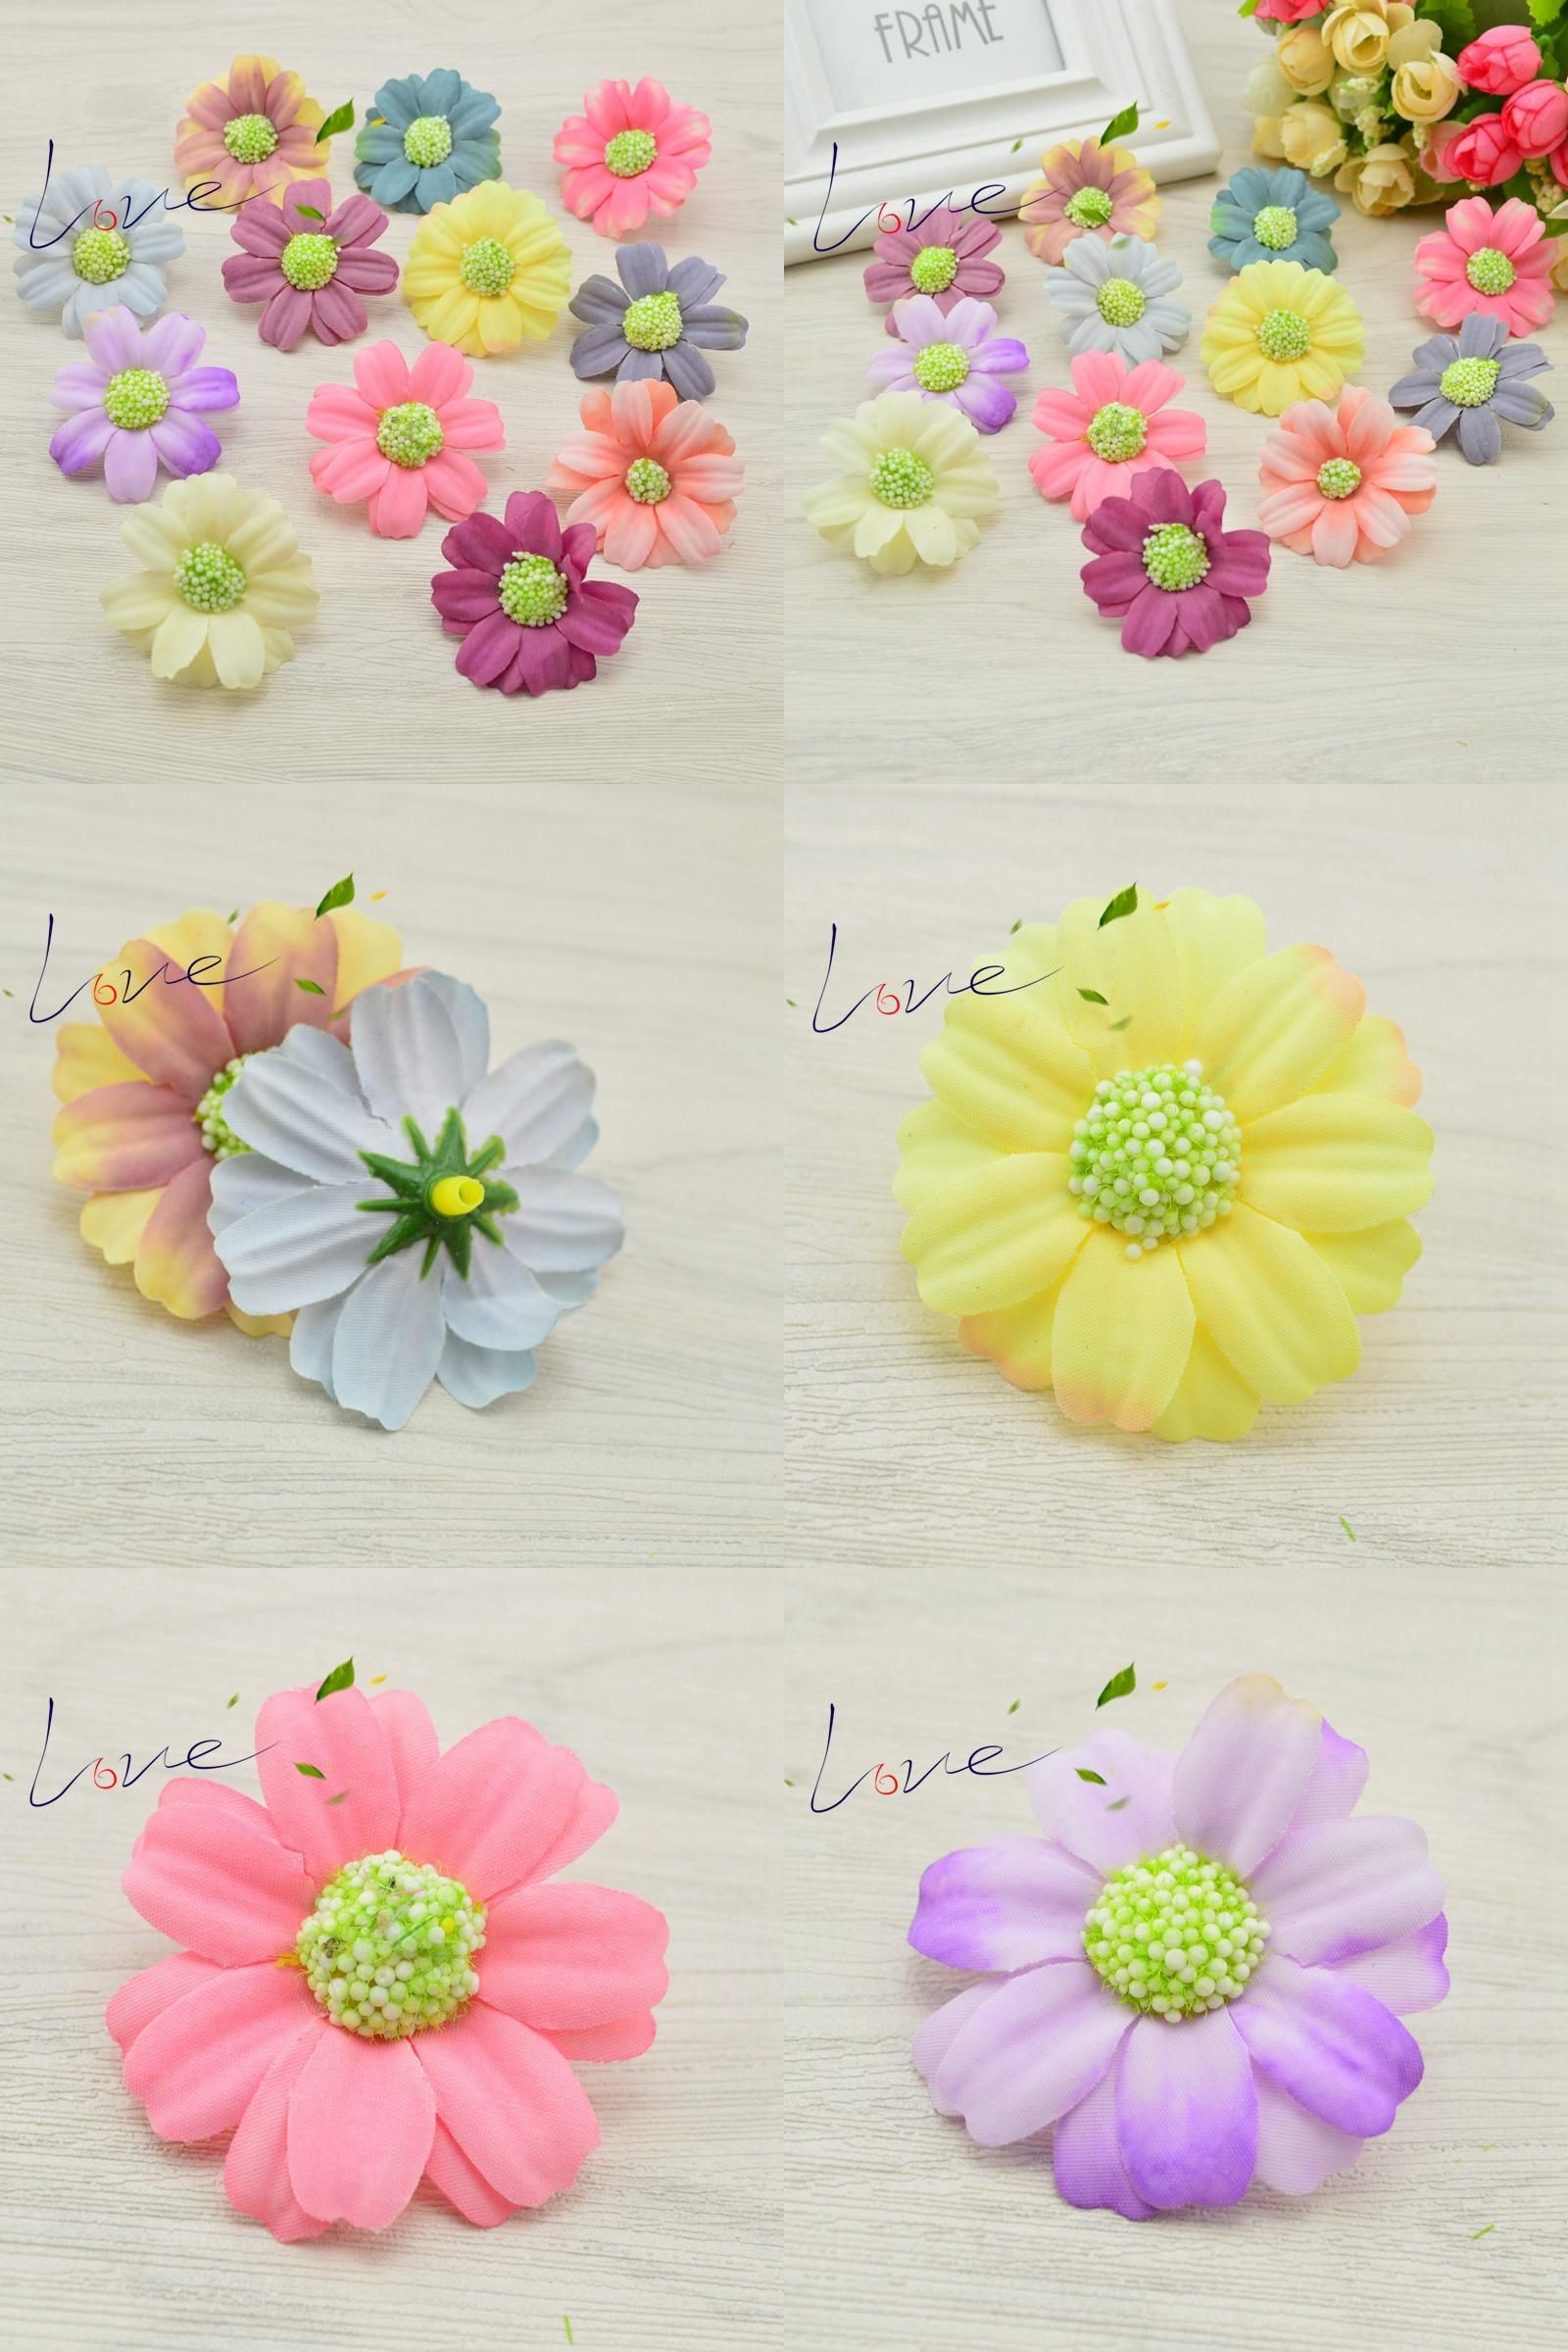 Visit To Buy 10 Pcs Cheap Artificial Daisy Flower Bride Wedding